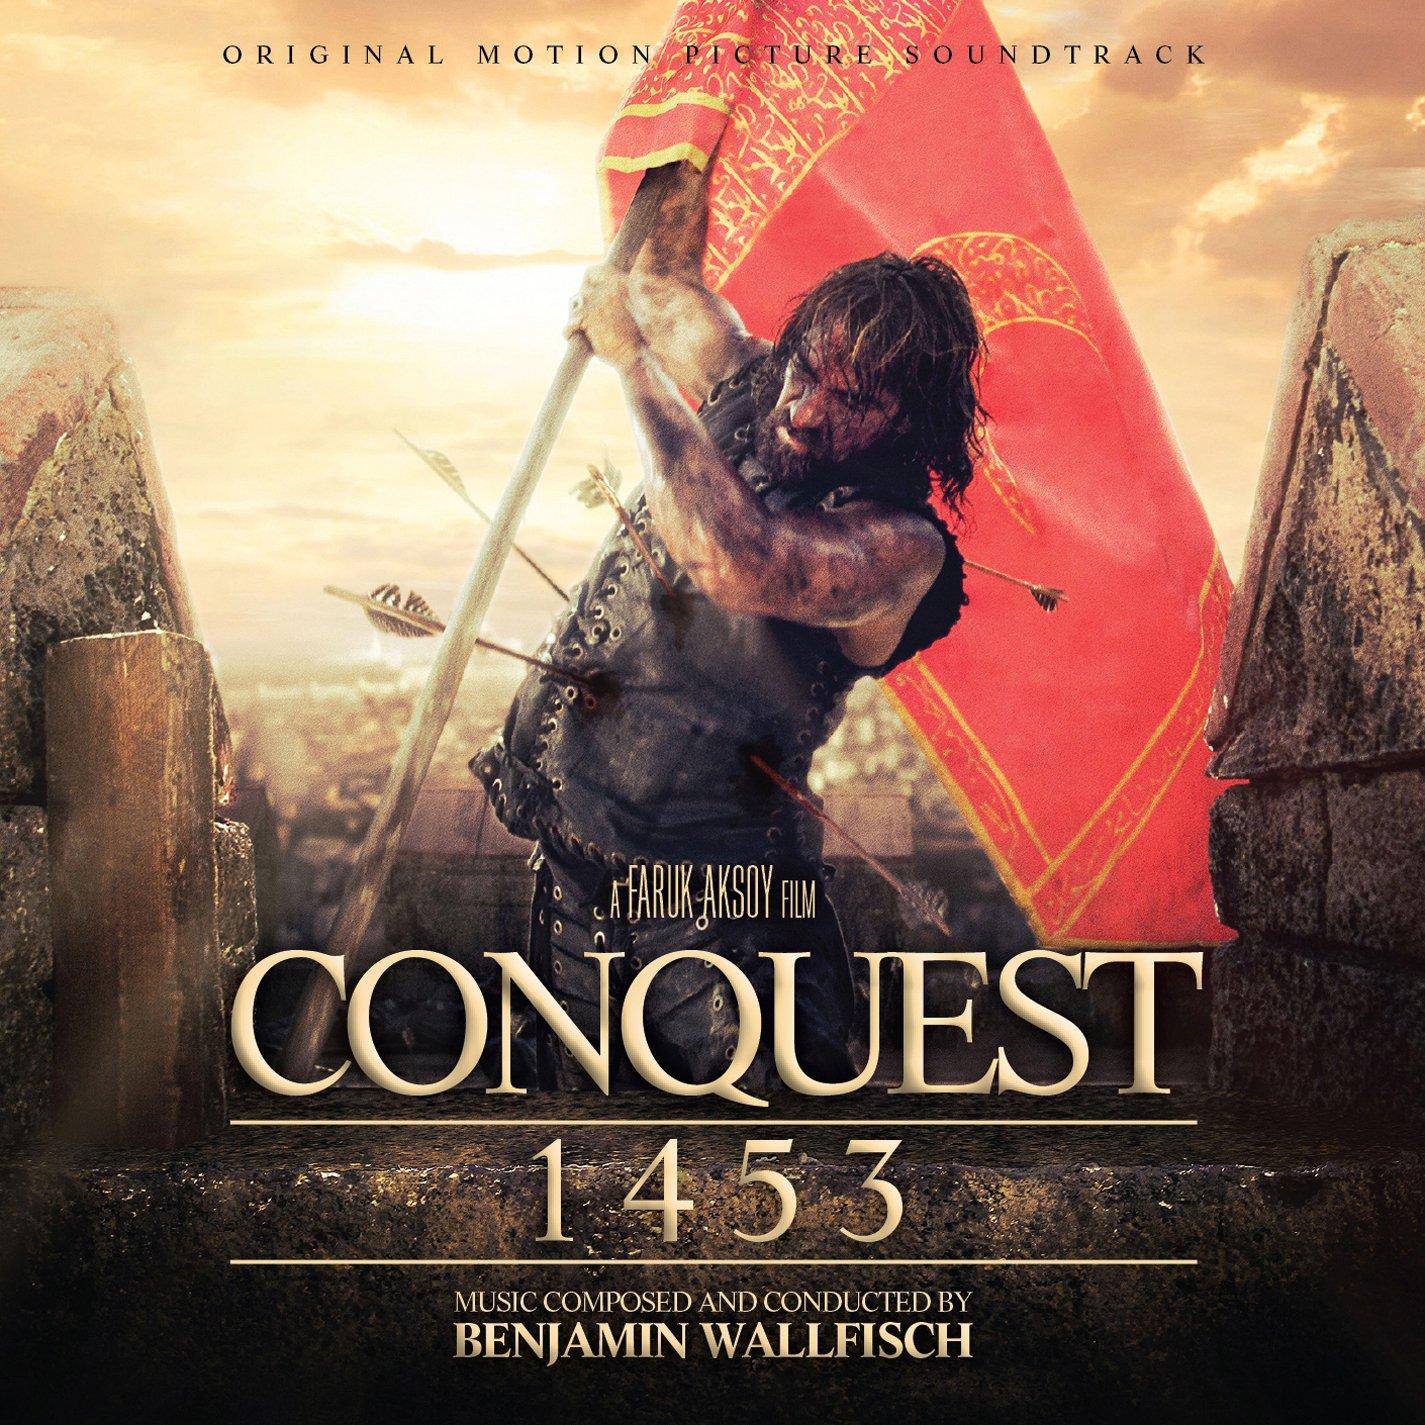 Conquest 1453 (original motion picture soundtrack) by various.